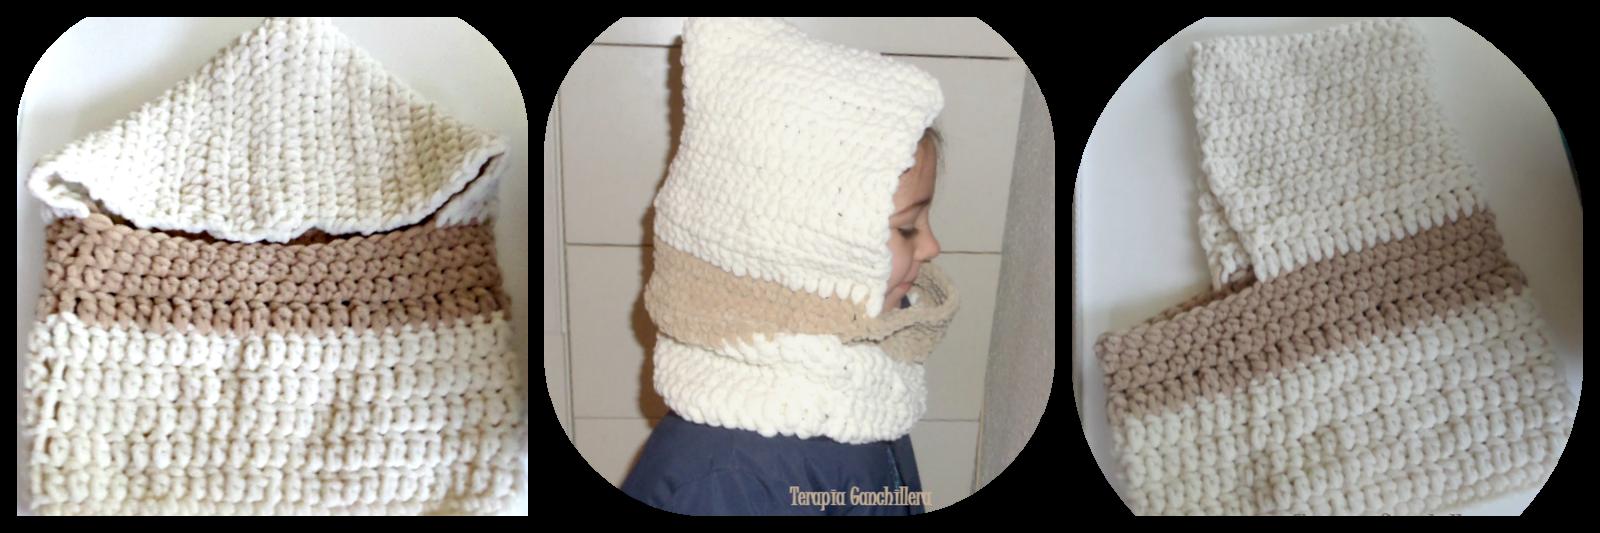 cuello-capucha-crochet-crudo-marron-lana-bambi